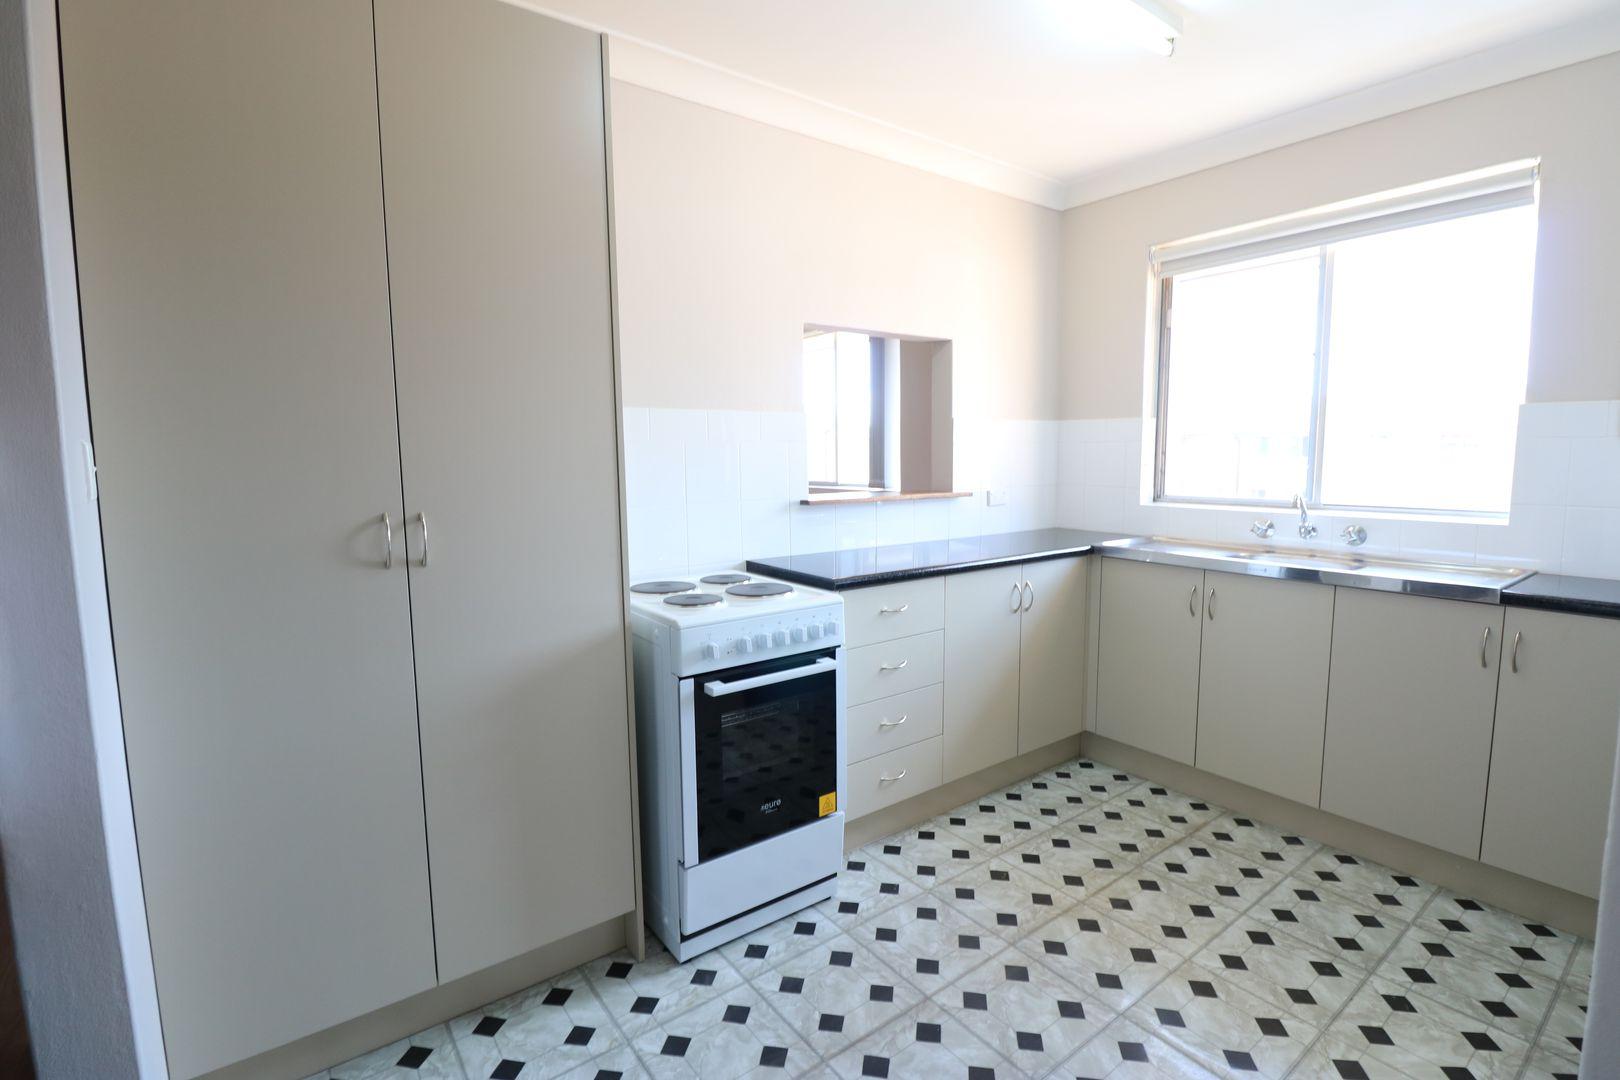 33/4-8 St Johns Rd, Cabramatta NSW 2166, Image 1